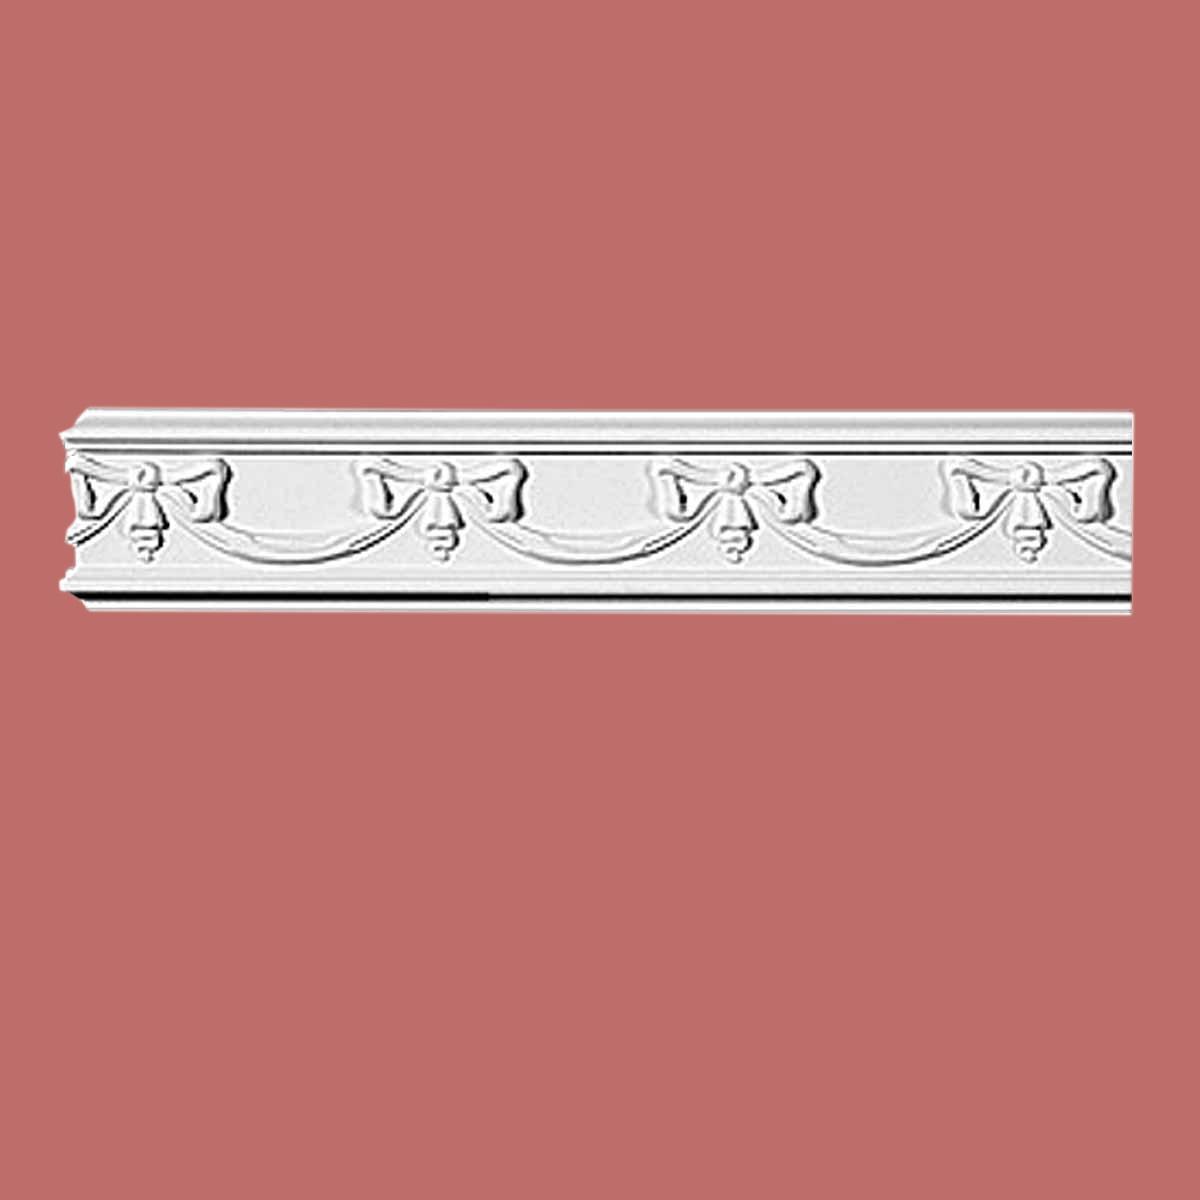 Cornice White Urethane 23.5 Sample of 11628 Cornice Cornice Moulding Cornice Molding